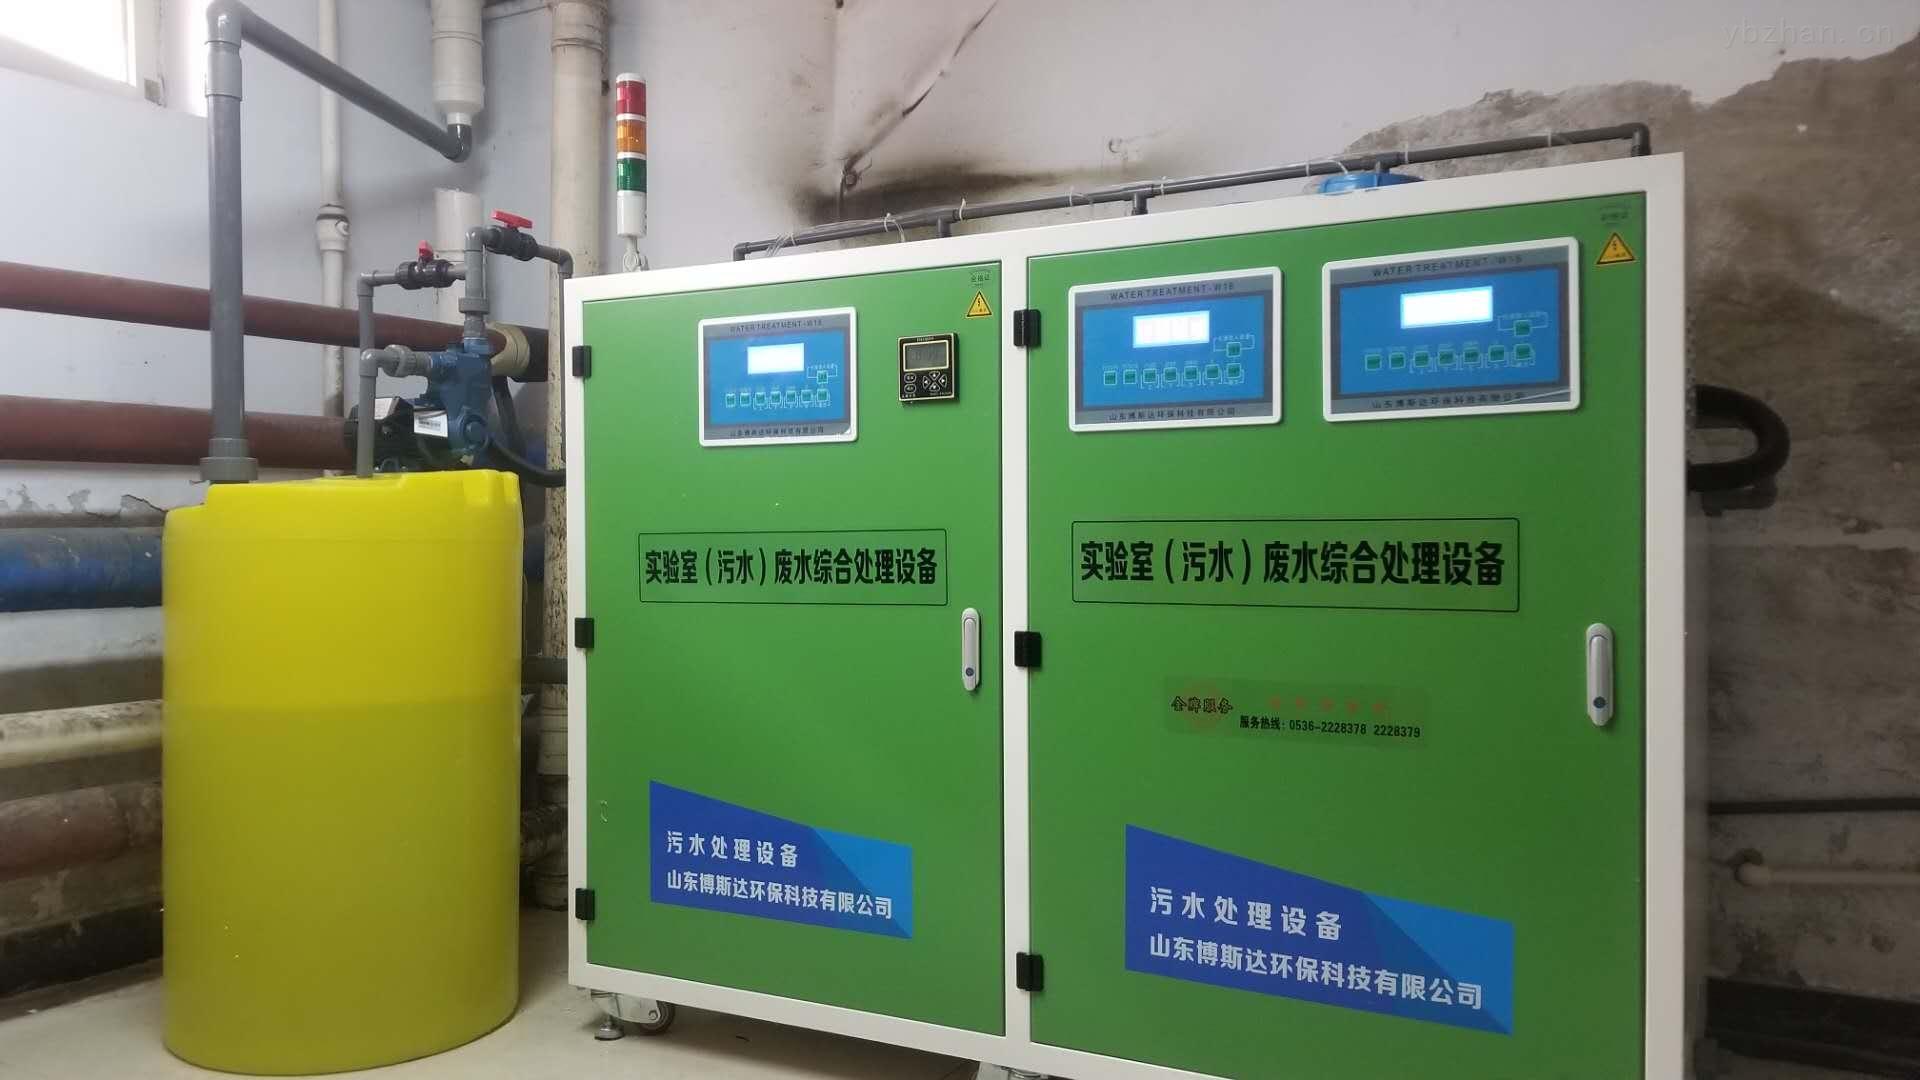 XSYF-500L-D疾控中心实验室污水处理装置每日